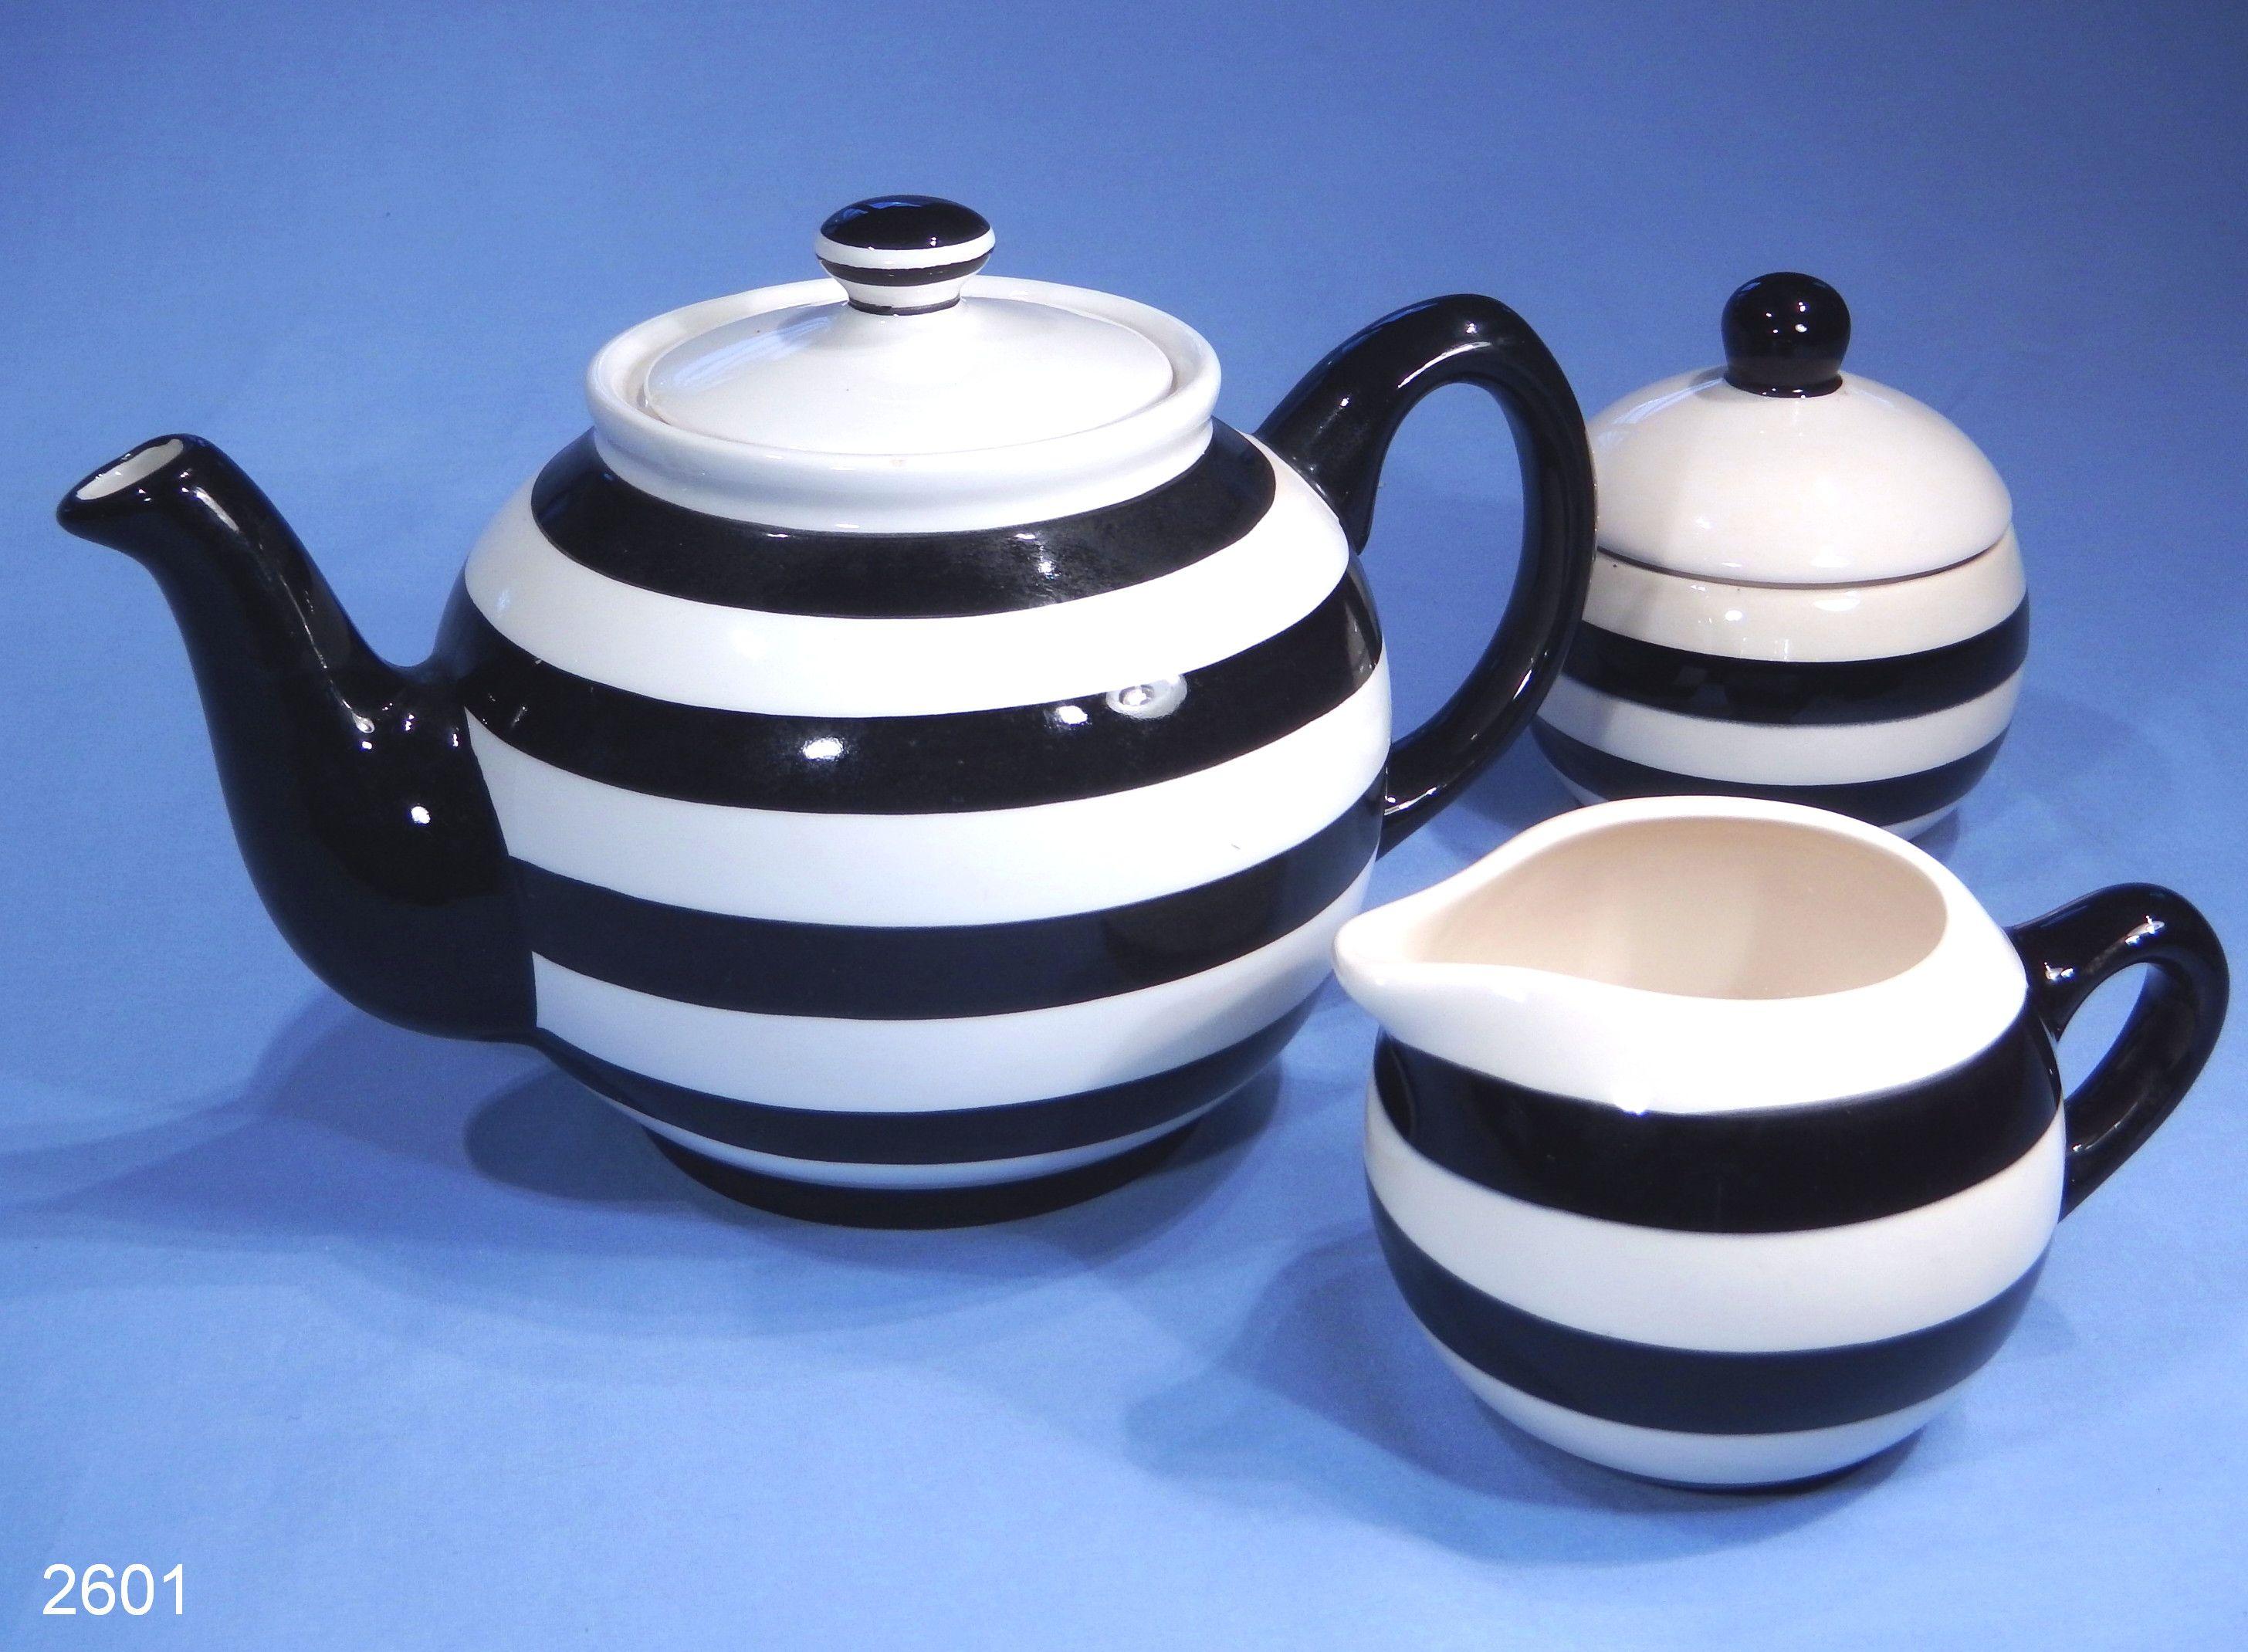 Sugar bowls with lids - Price Kensington Pristine Pottery Black And White Vintage Teapot Milk Jug And Sugar Bowl Set